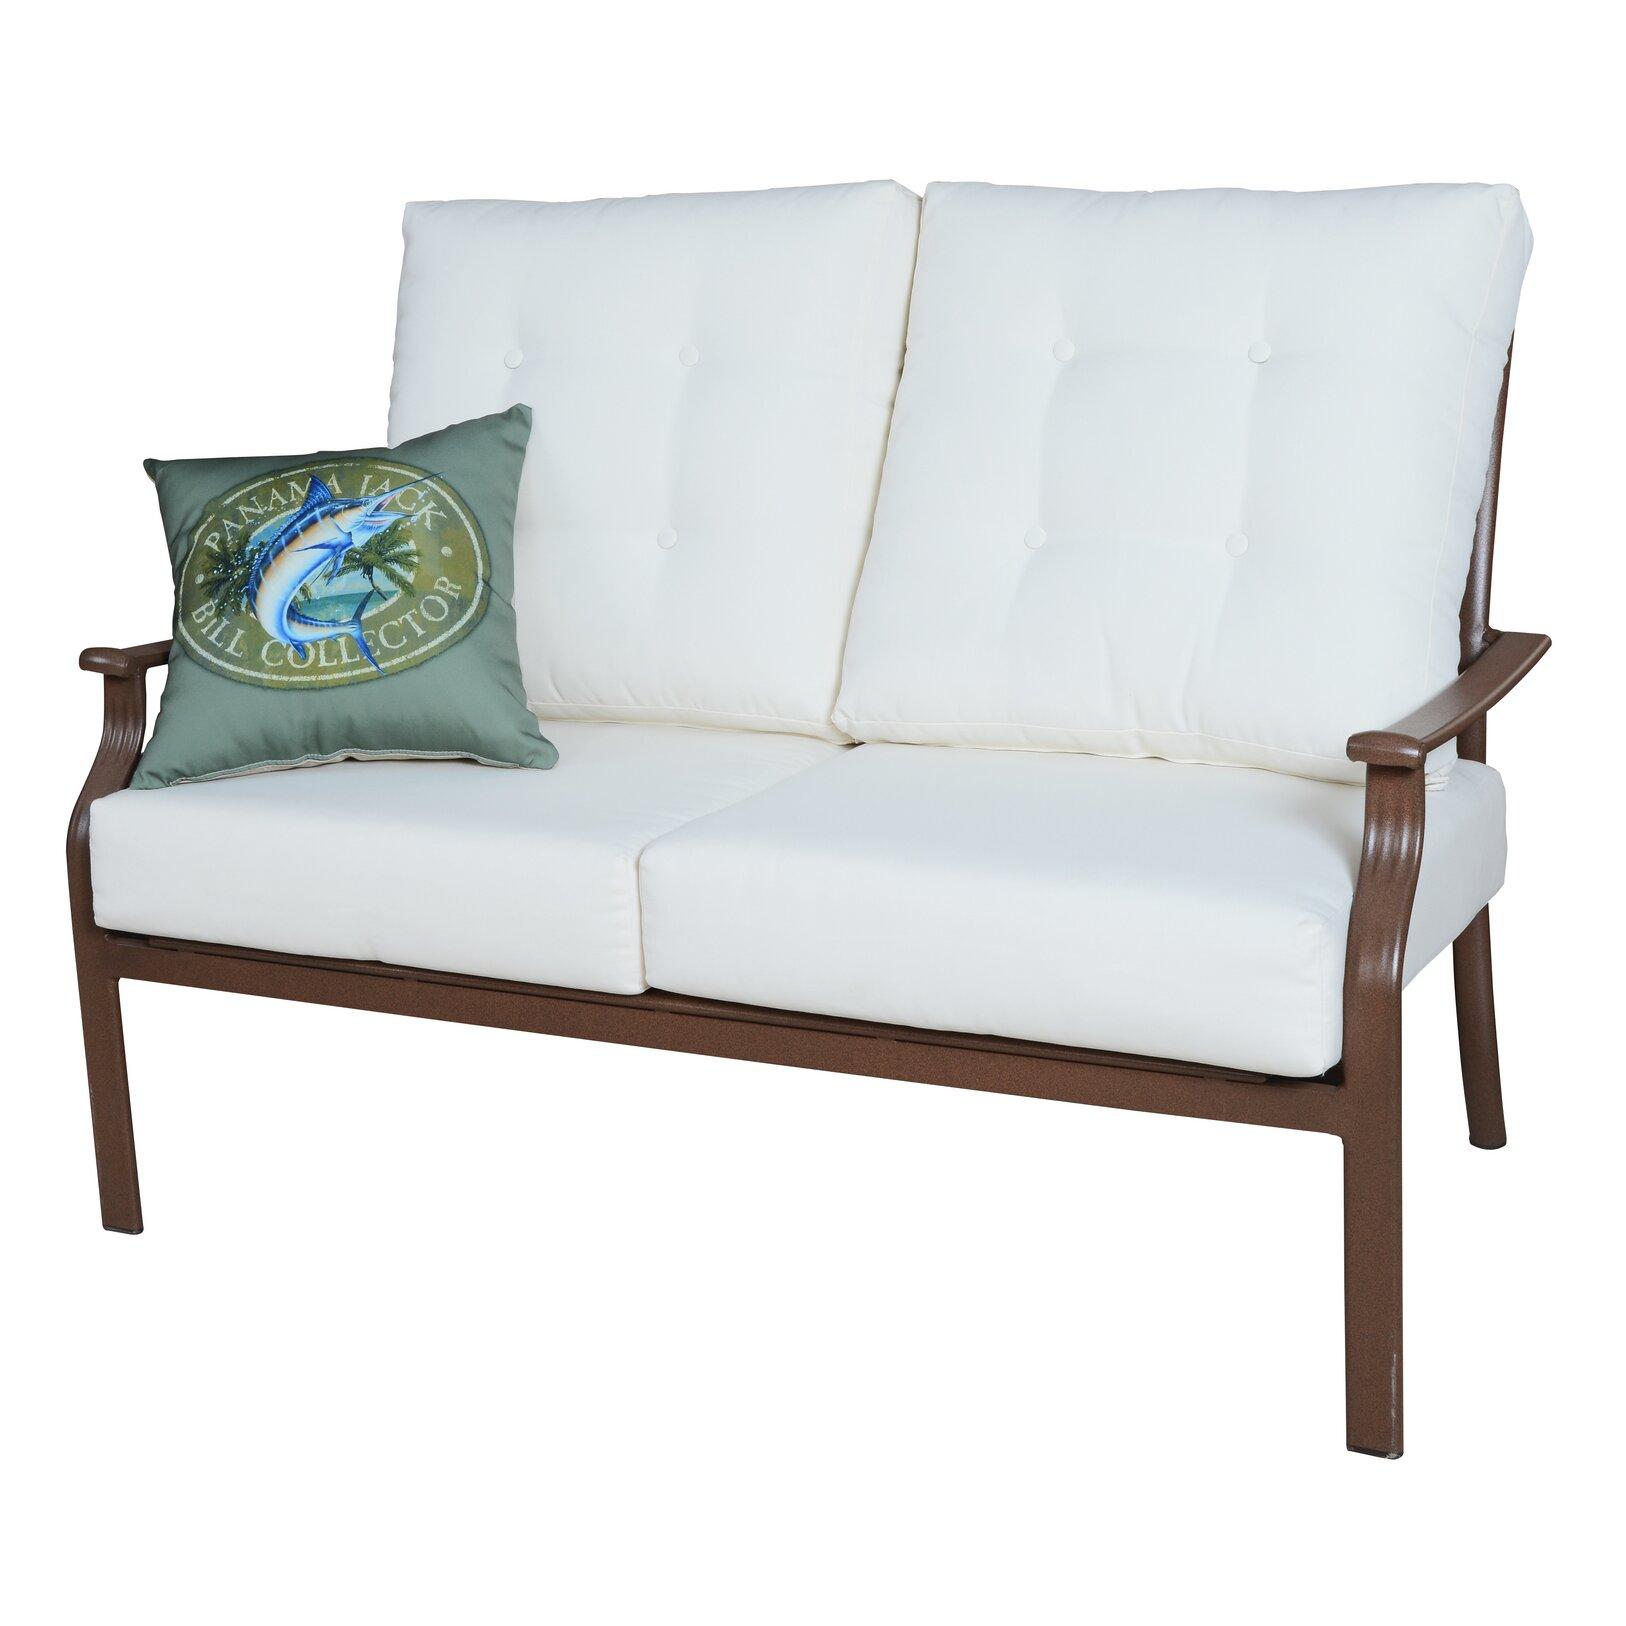 Panama Jack Island Breeze Deep Seating Loveseat with Cushions & Reviews | Wayfair